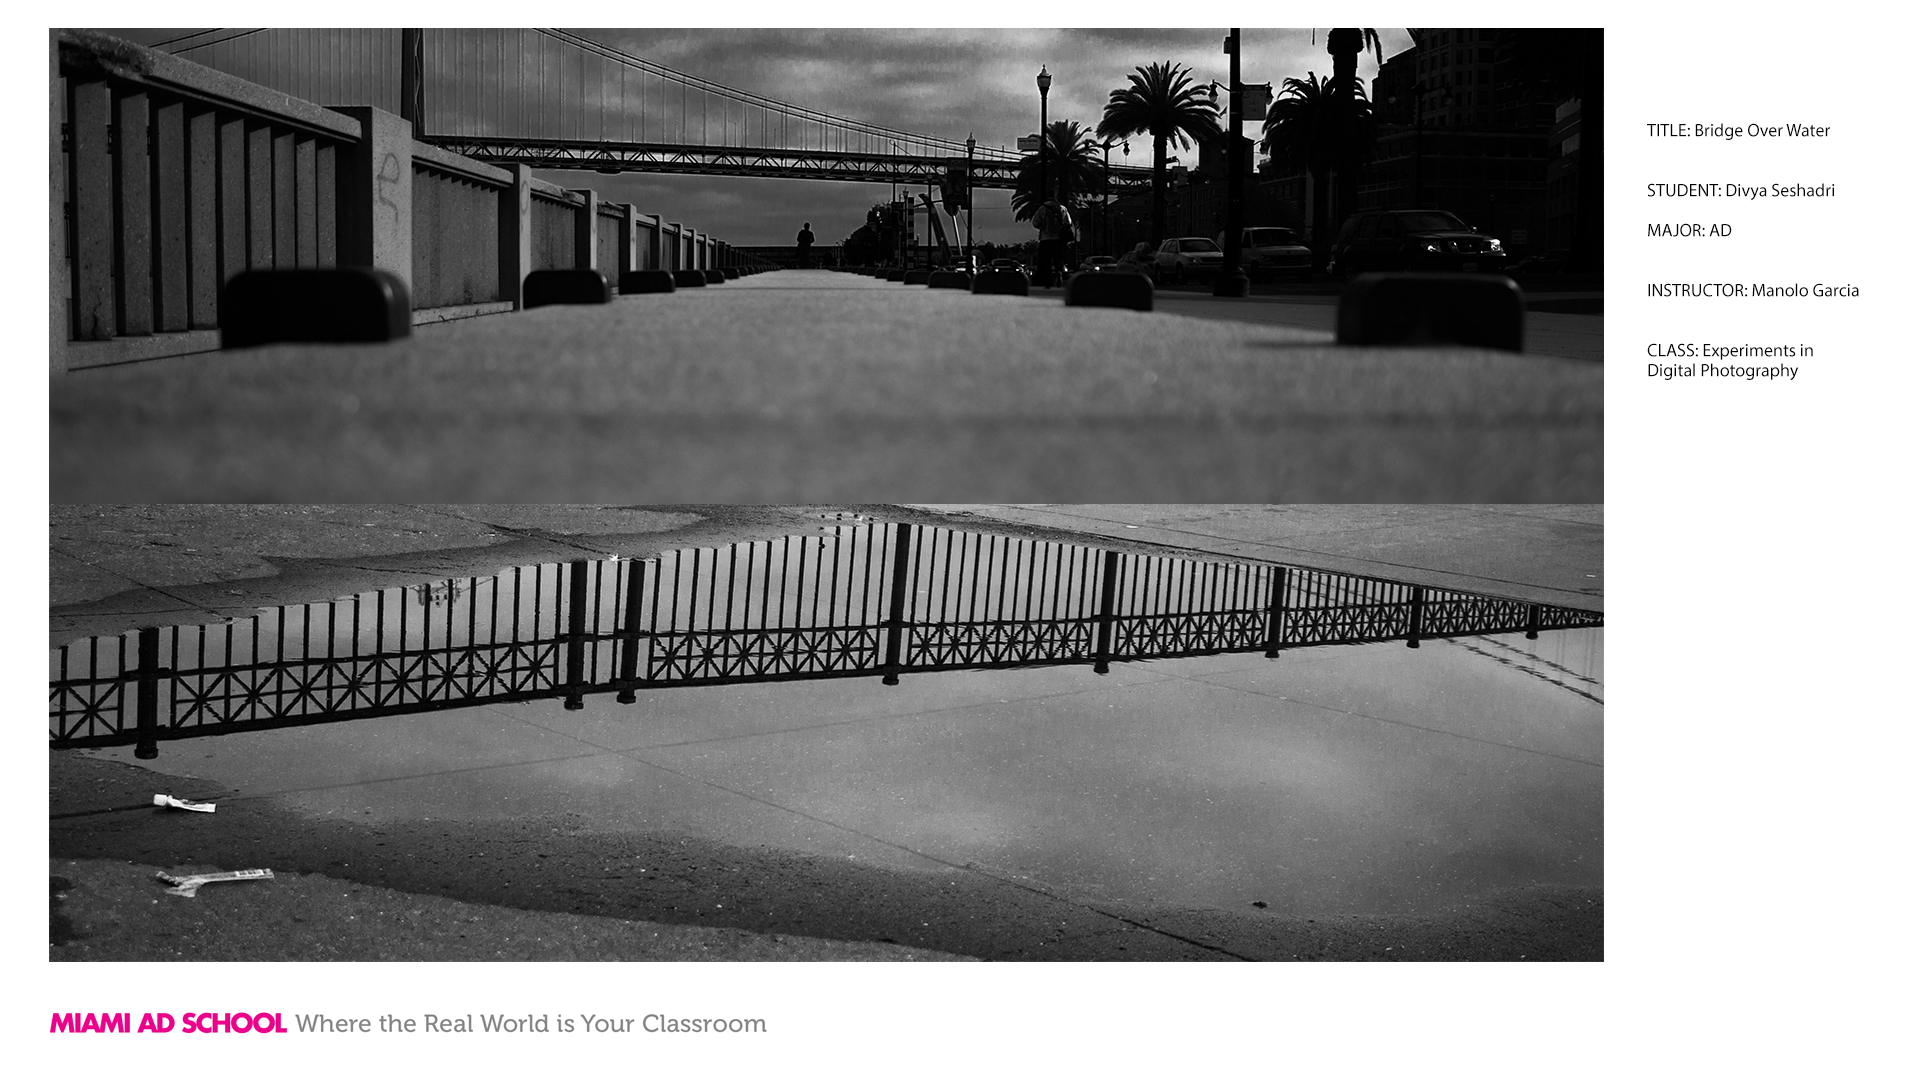 Divya_Ferry_Bridge_Over_Water.jpg